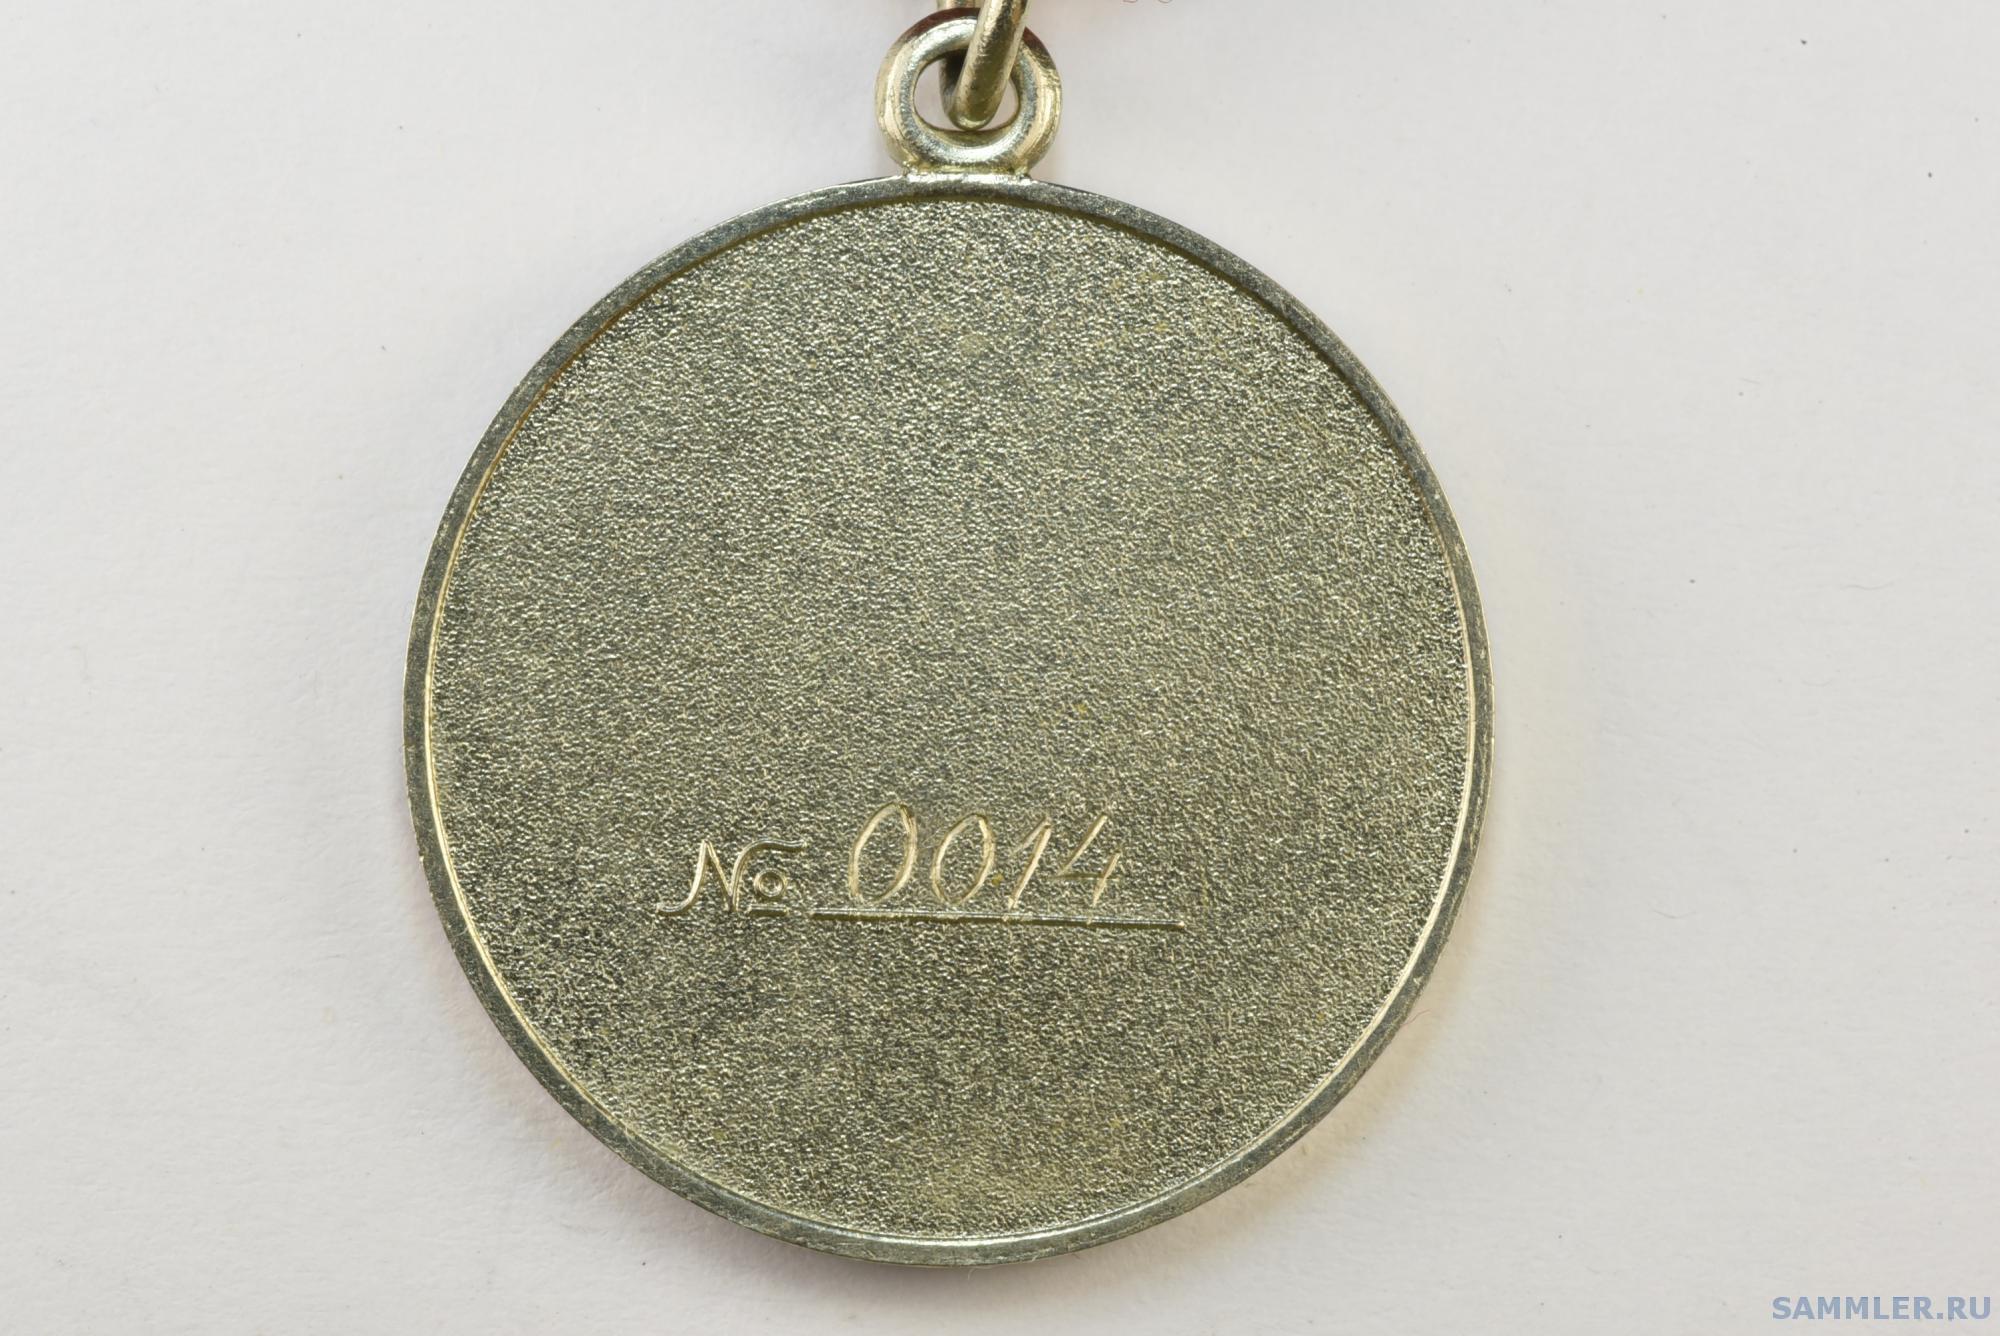 DSC_1252.JPG